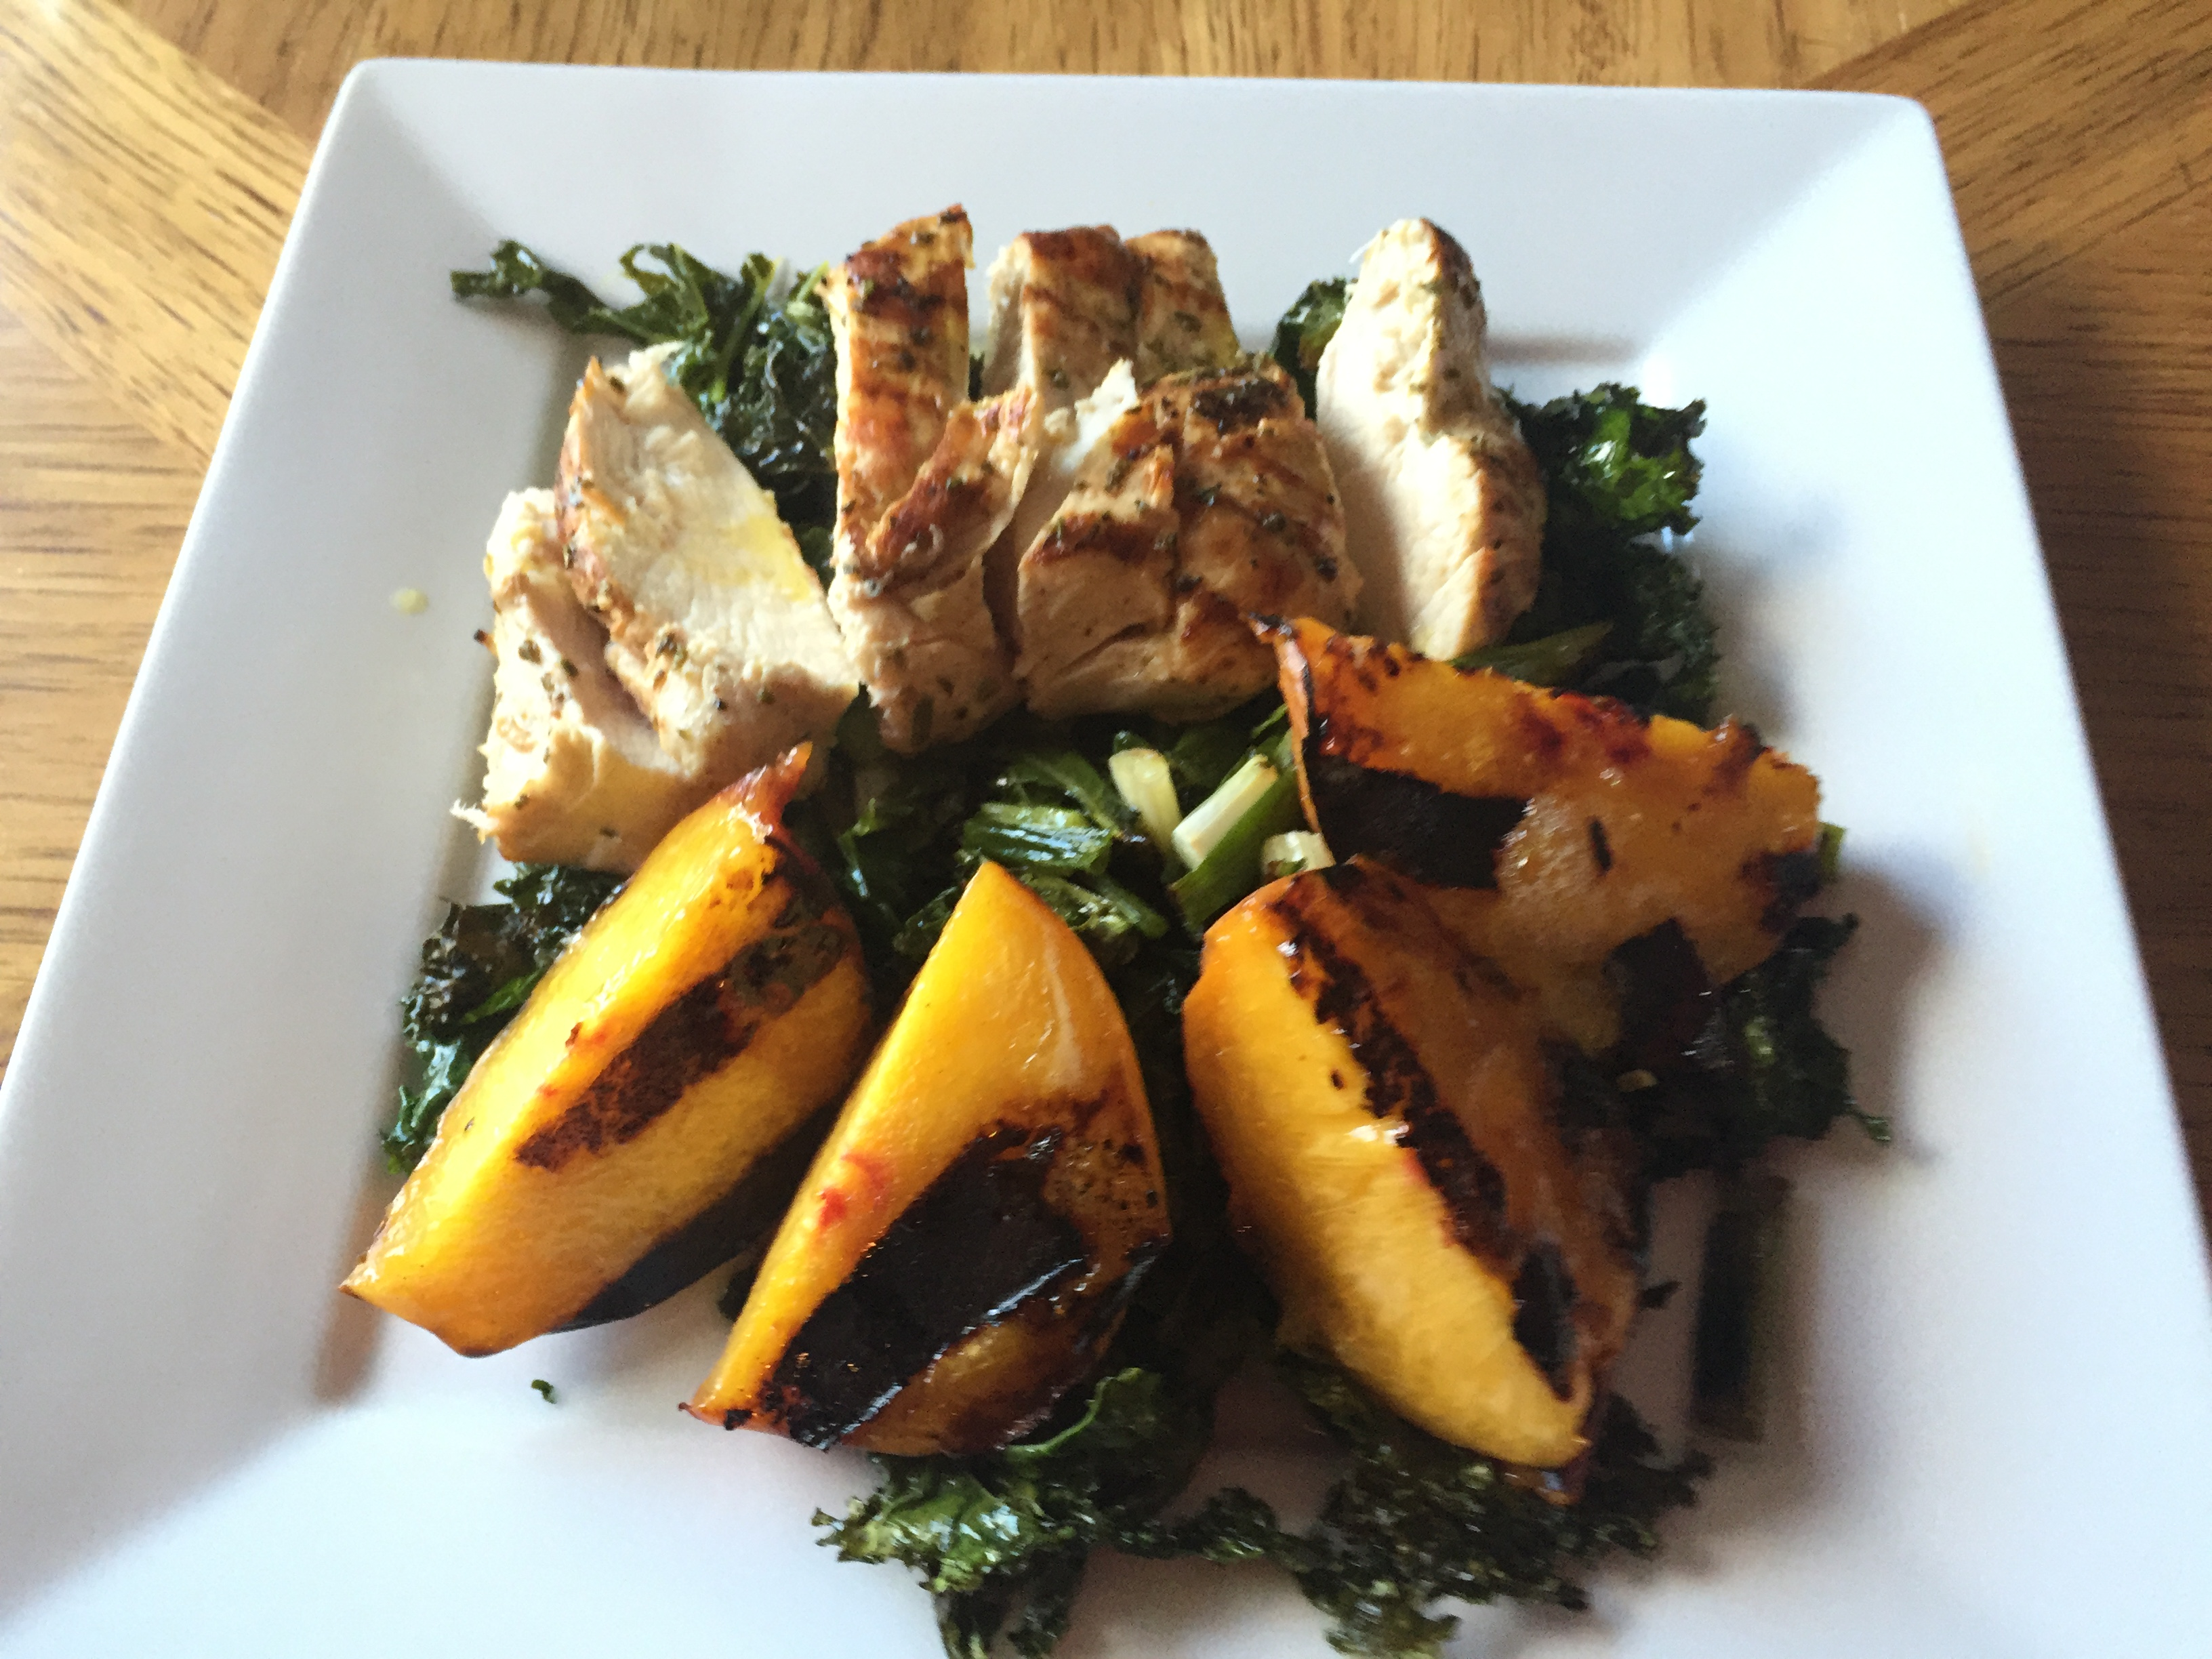 Summer Recipe (Grilled Peach Salad)